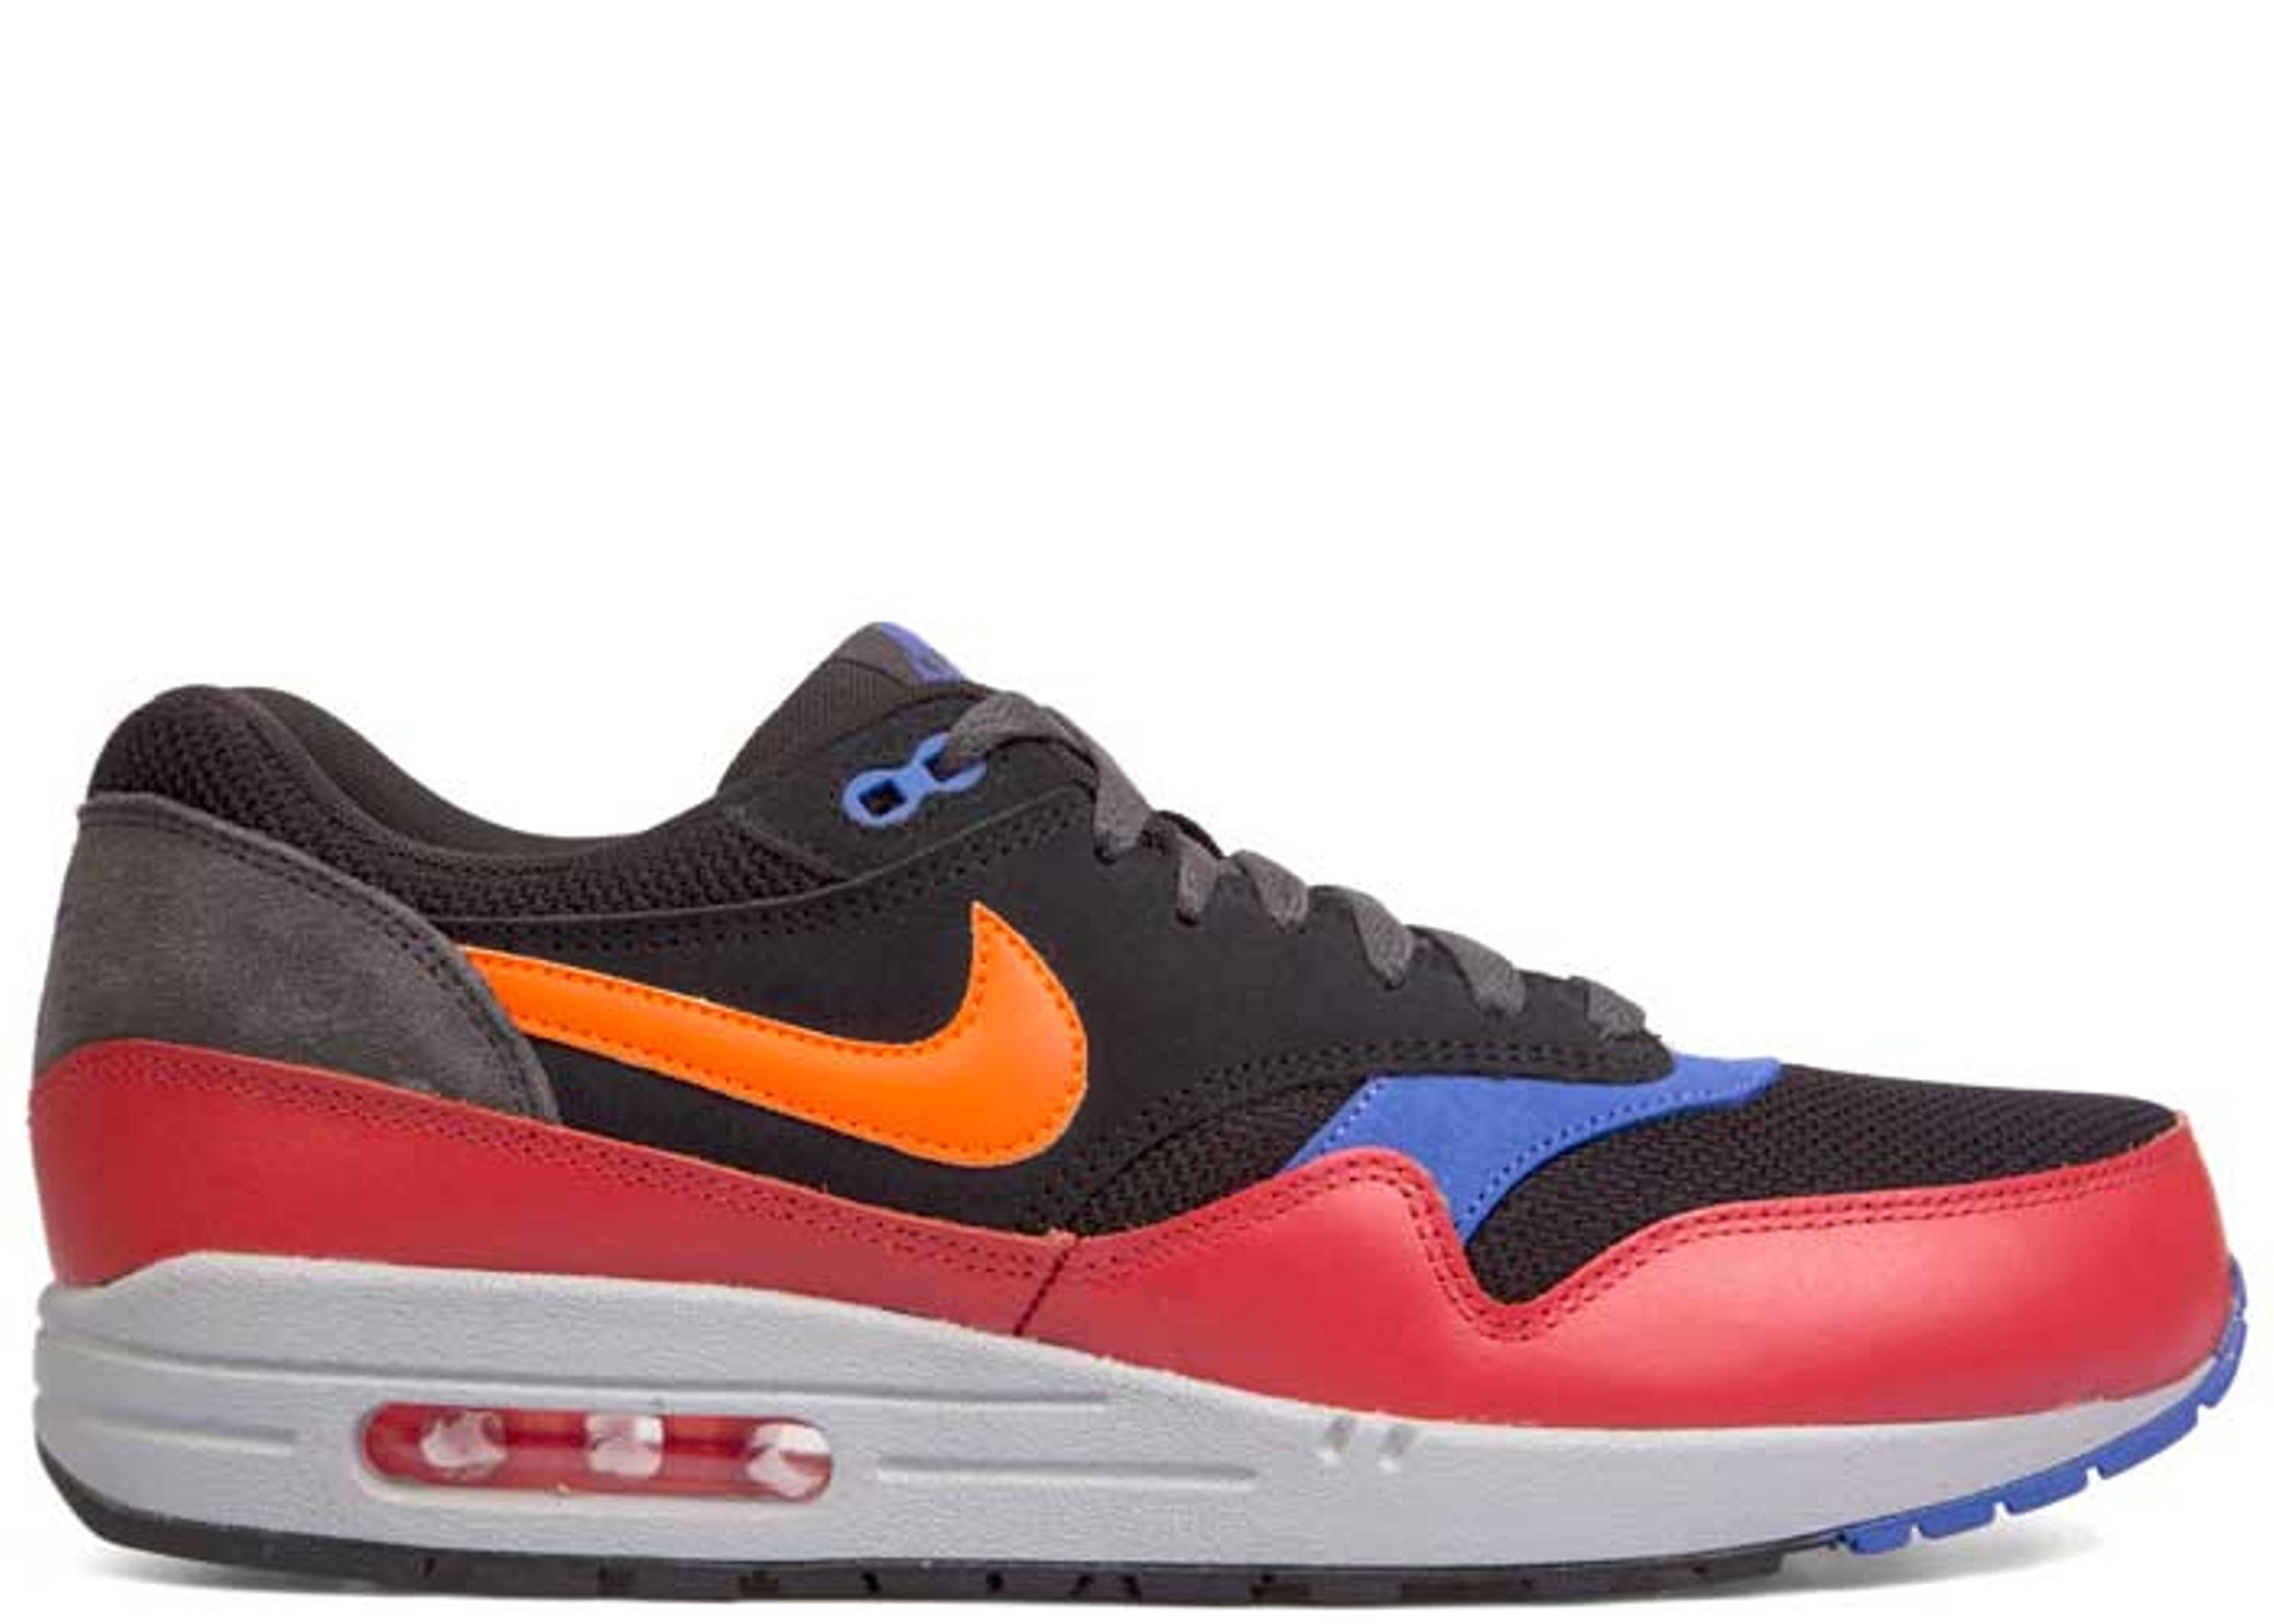 31065683c721ec Air Max 1 Essential - Nike - 537383 017 - black   hyper crimson-red clay